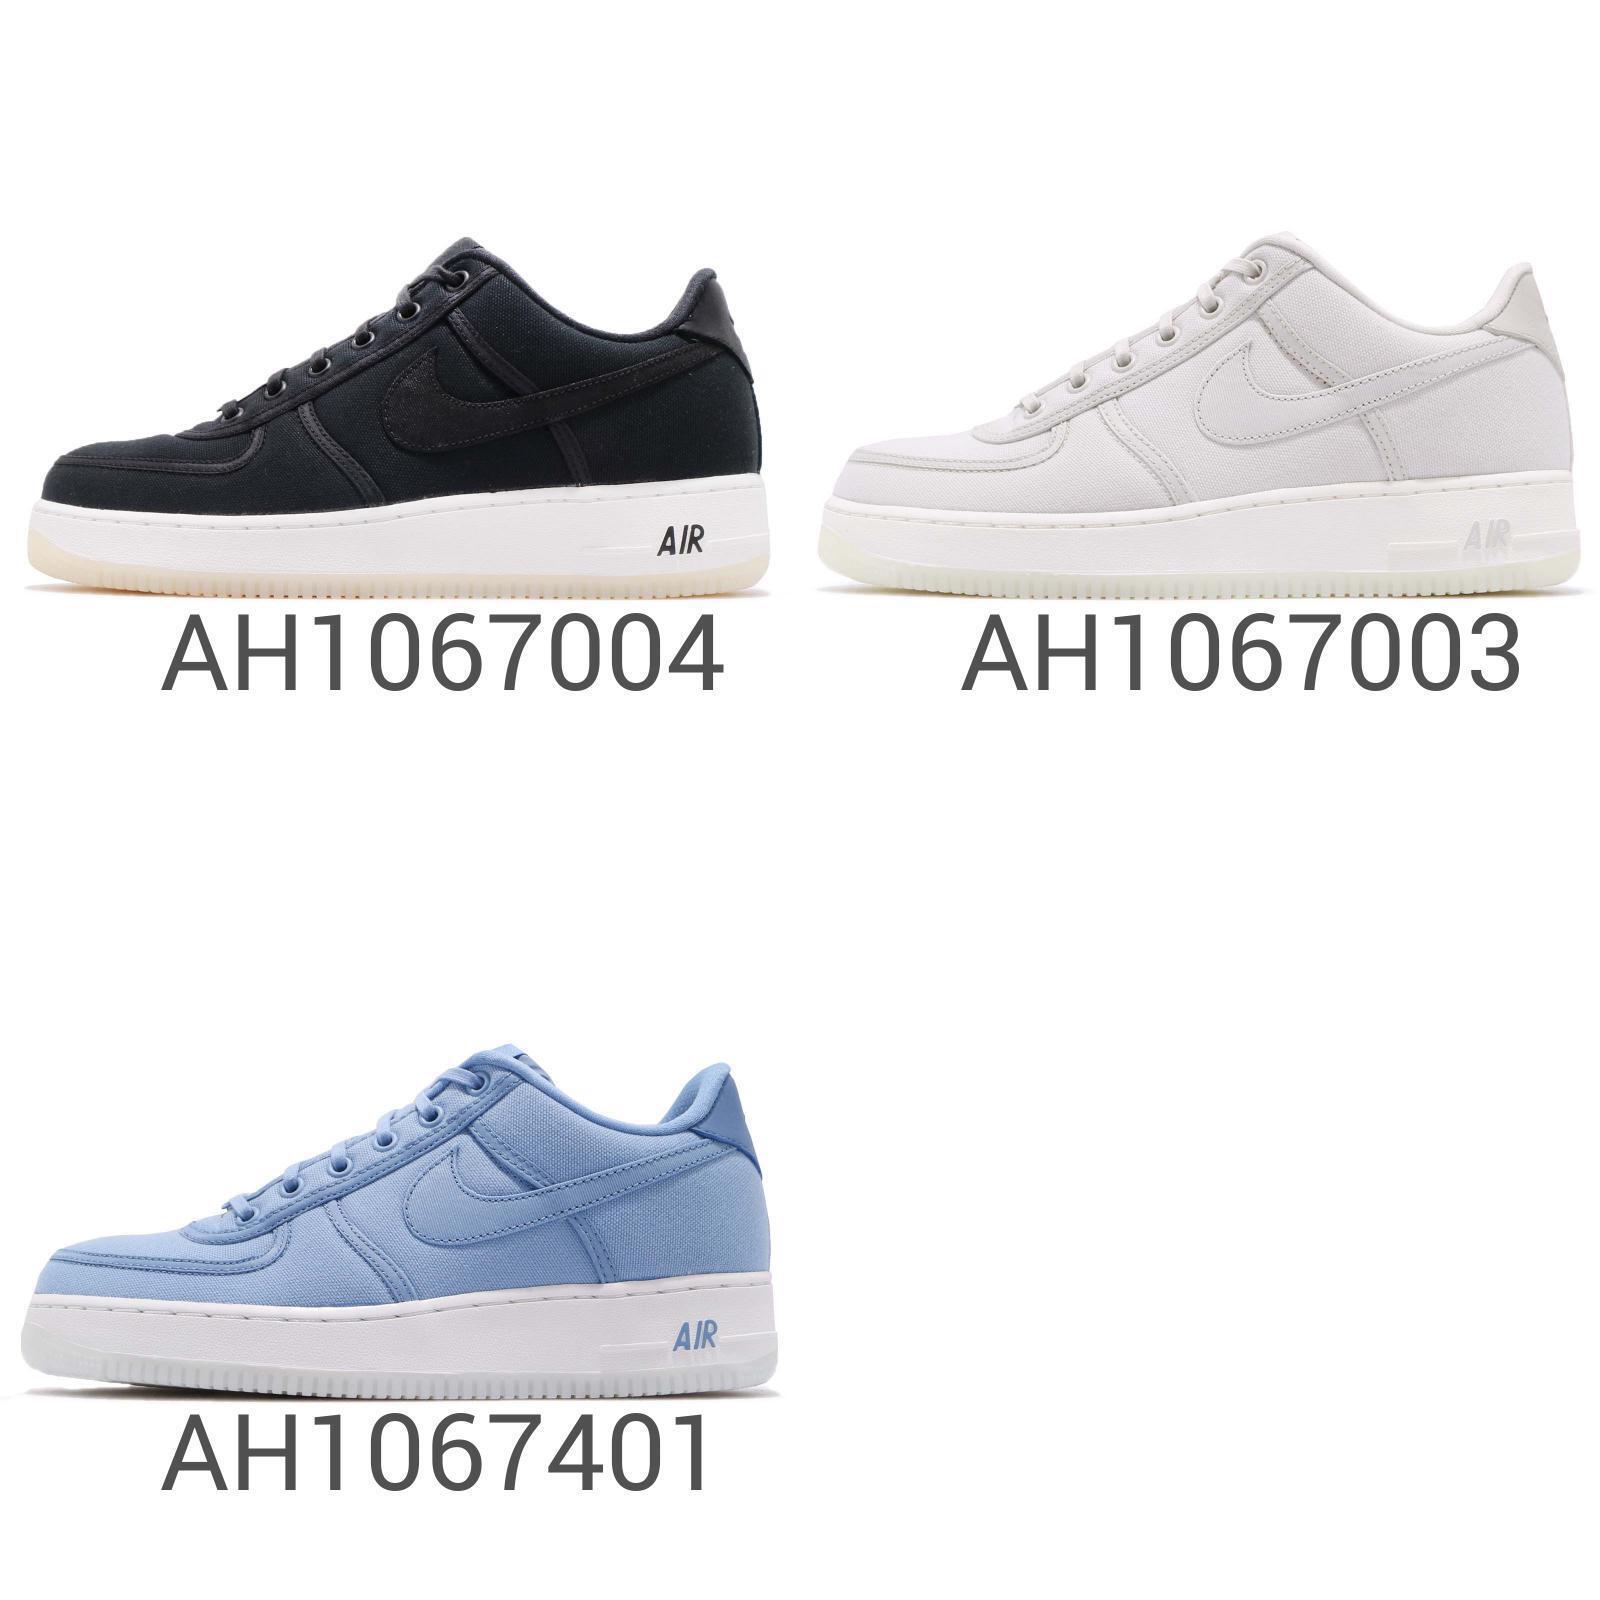 Nike Air Force 1 Low Retro QS CNVS Canvas AF1 Pick One Men Sneakers Shoes Pick AF1 1 d395f3